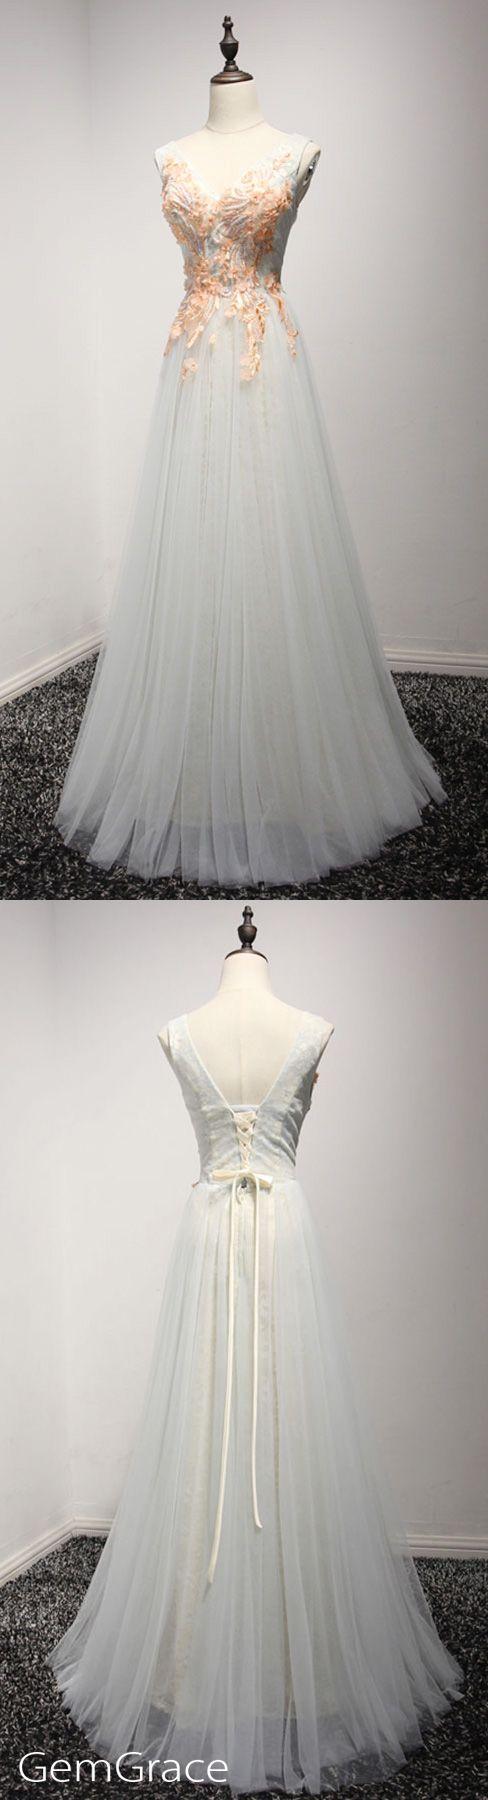 Custom formal dress